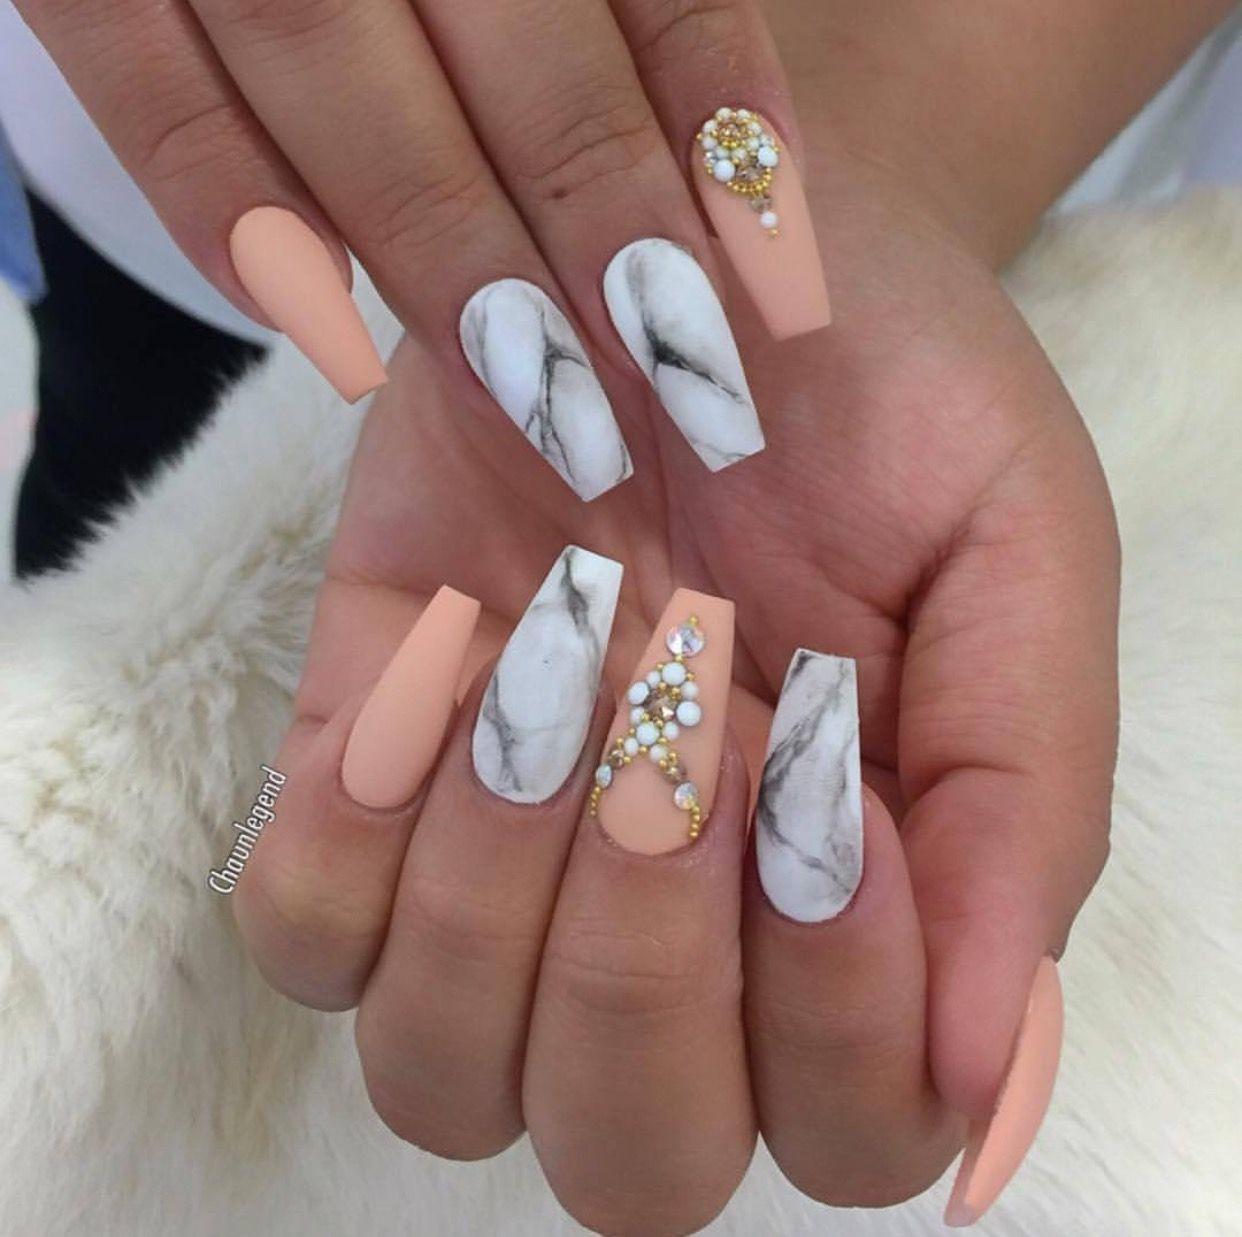 Pin by lizeth paolahernandez on nails marmol   Pinterest   Manicure ...